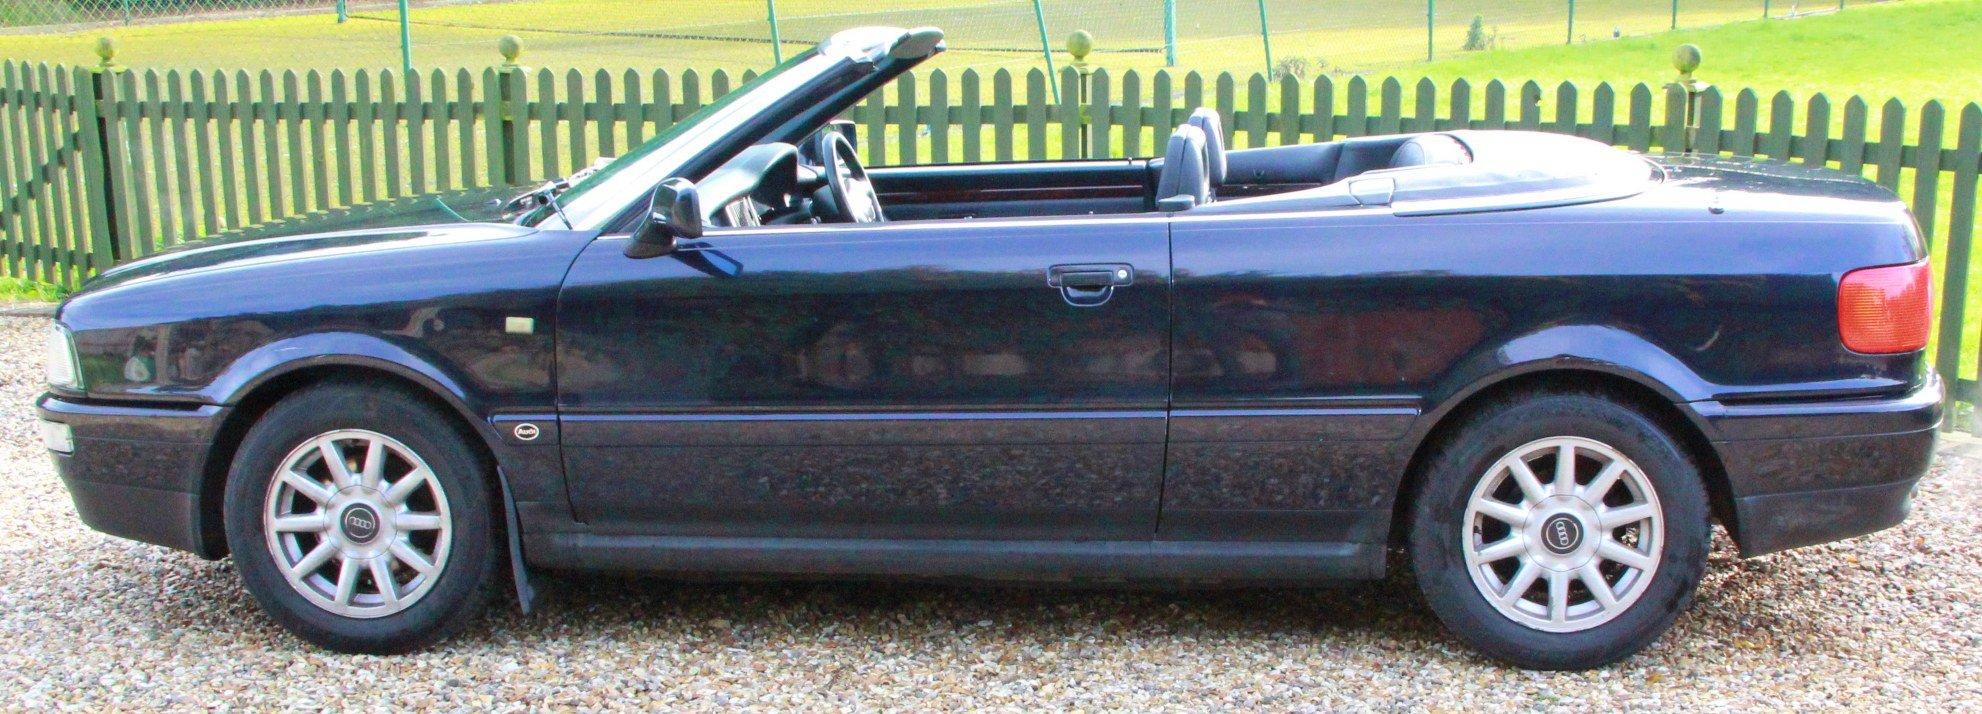 1995 Audi 80 2.0 Manual Convertible Very Original Car For Sale (picture 1 of 6)